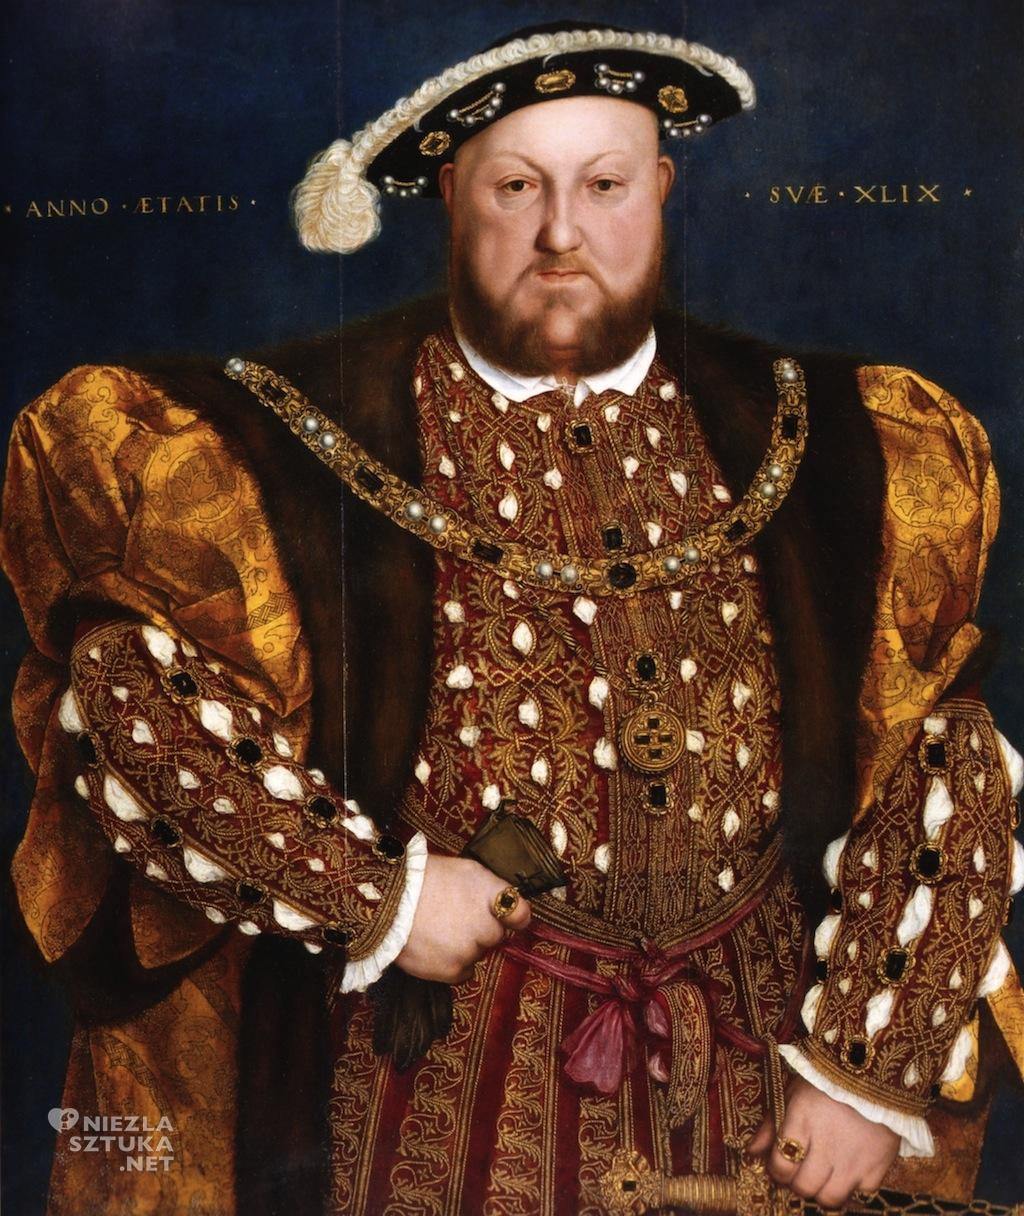 Hans Holbein Młodszy Portret Henryka VIII Galleria Nazionale d'Arte Antica di Palazzo Barberini, Rzym